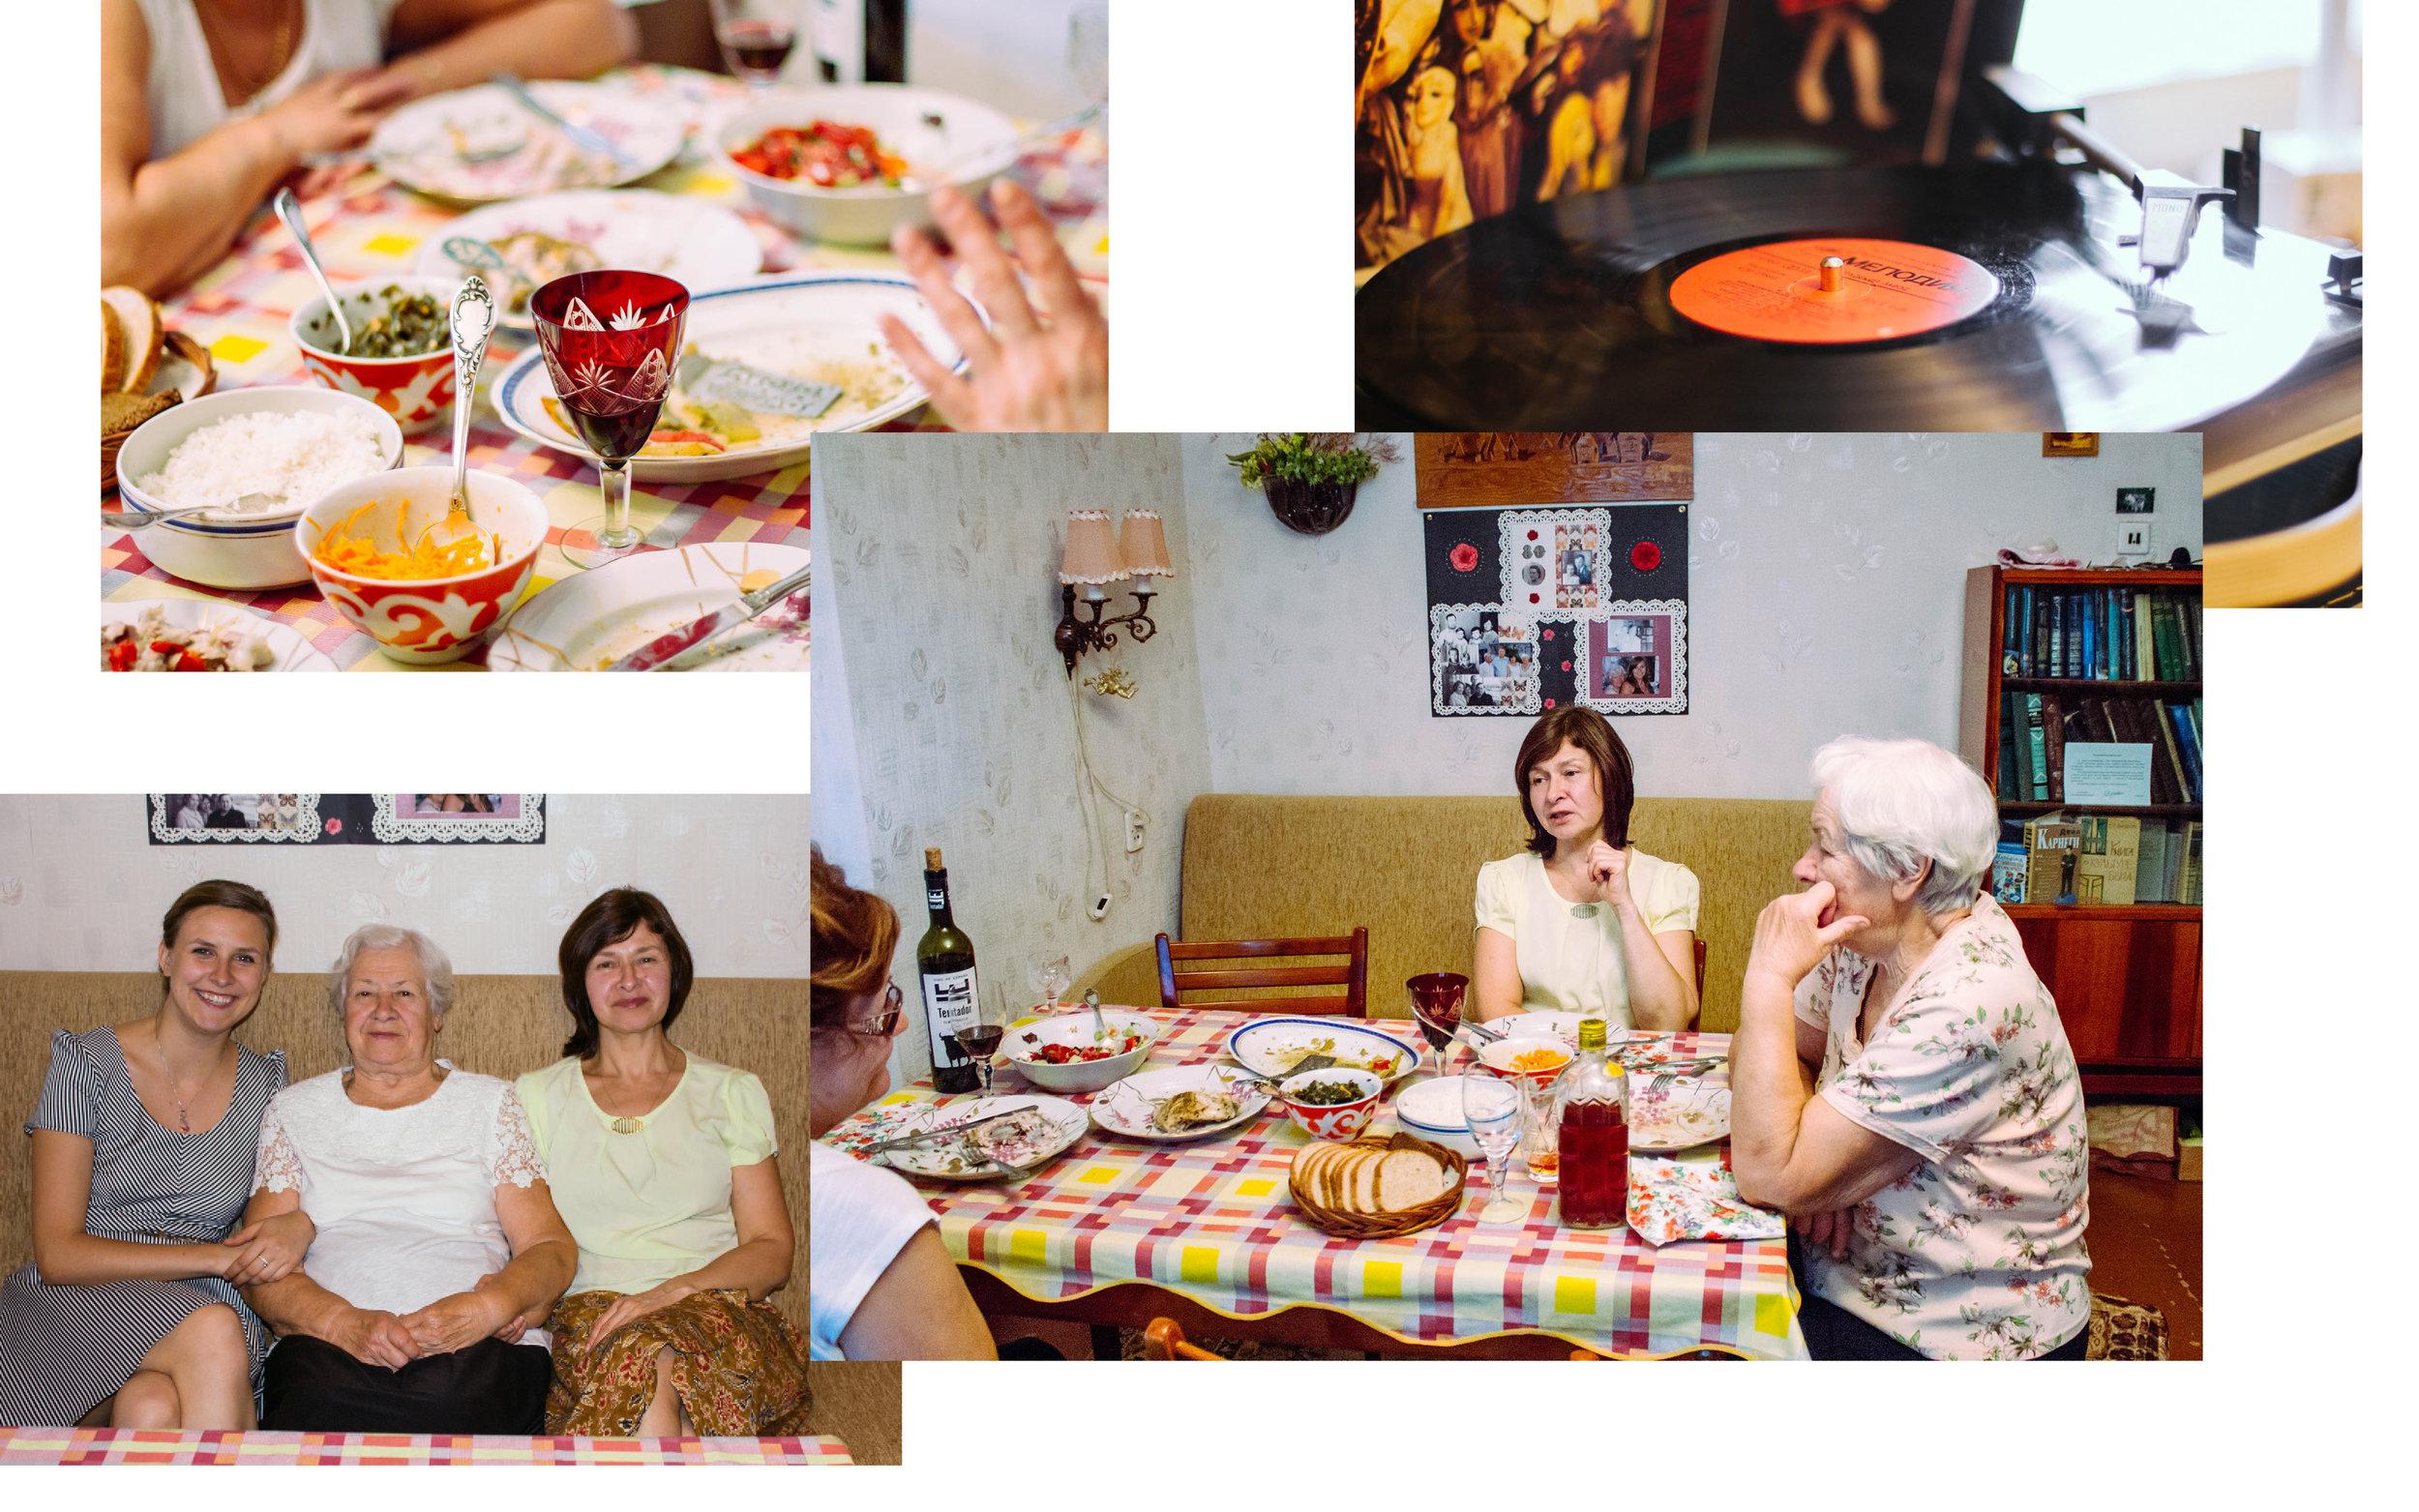 Kovtun_005_Russia_Photo_Book.jpg